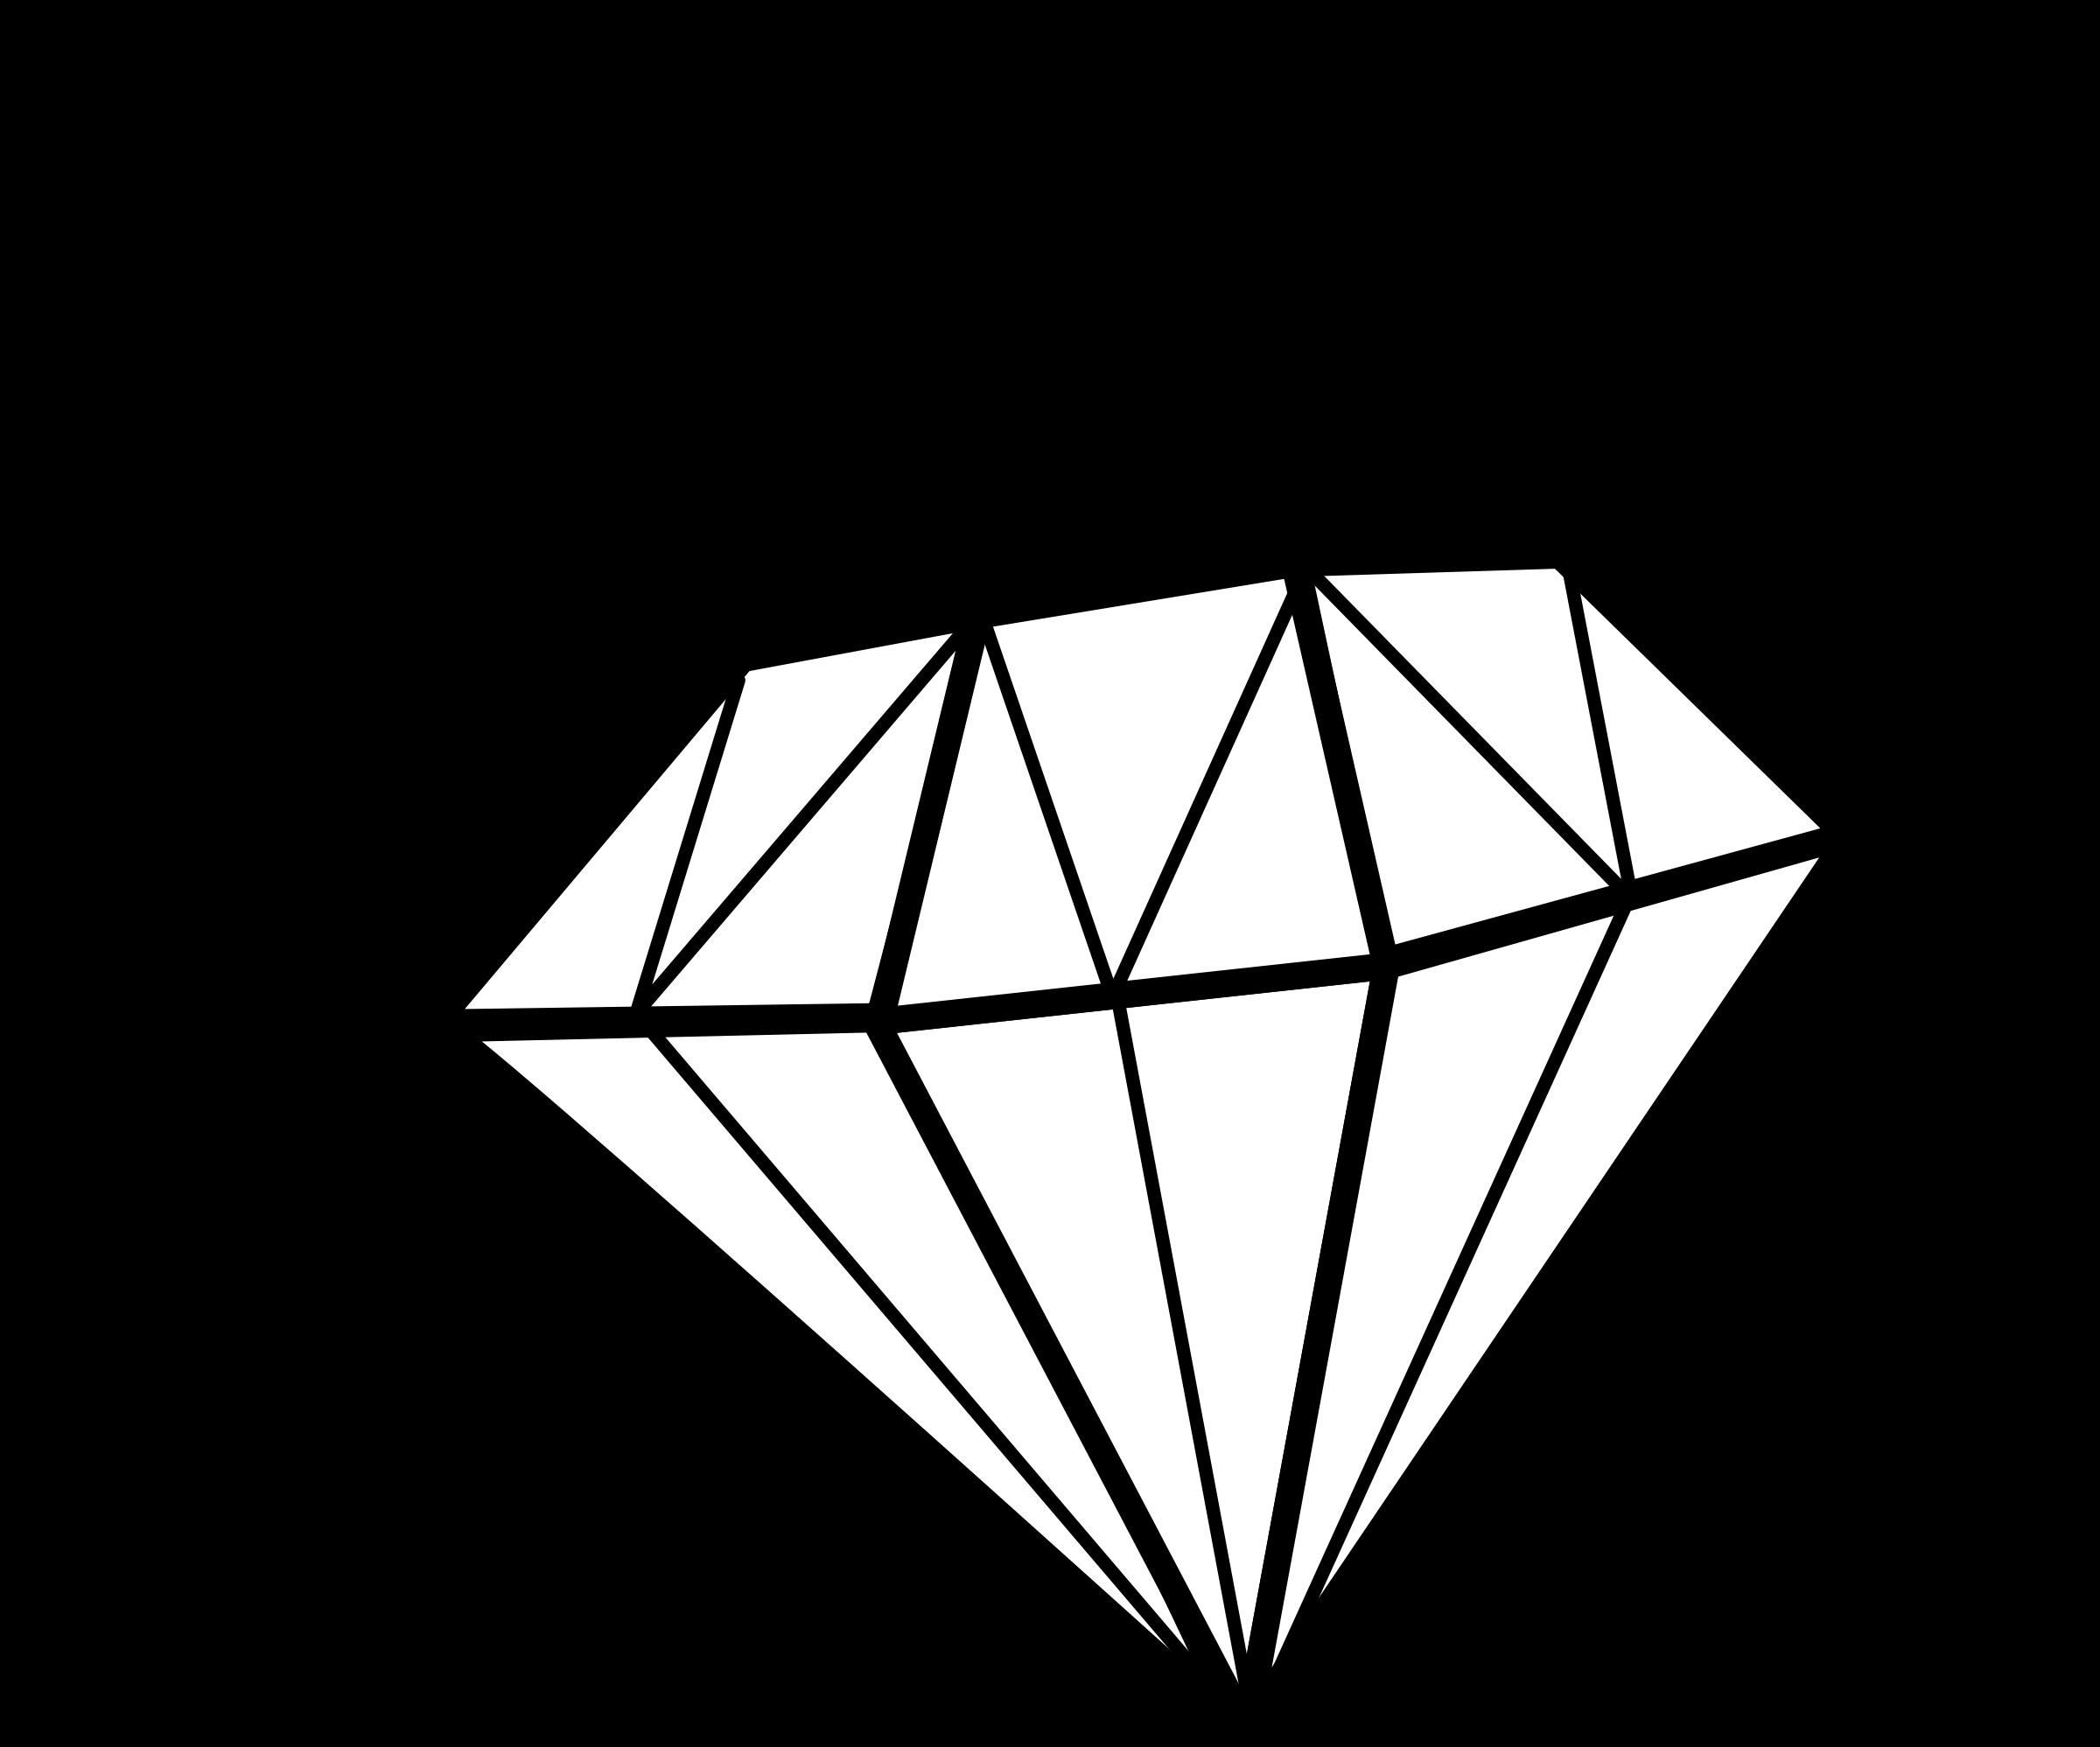 2400x1997 Free Diamond Clip Art Pictures